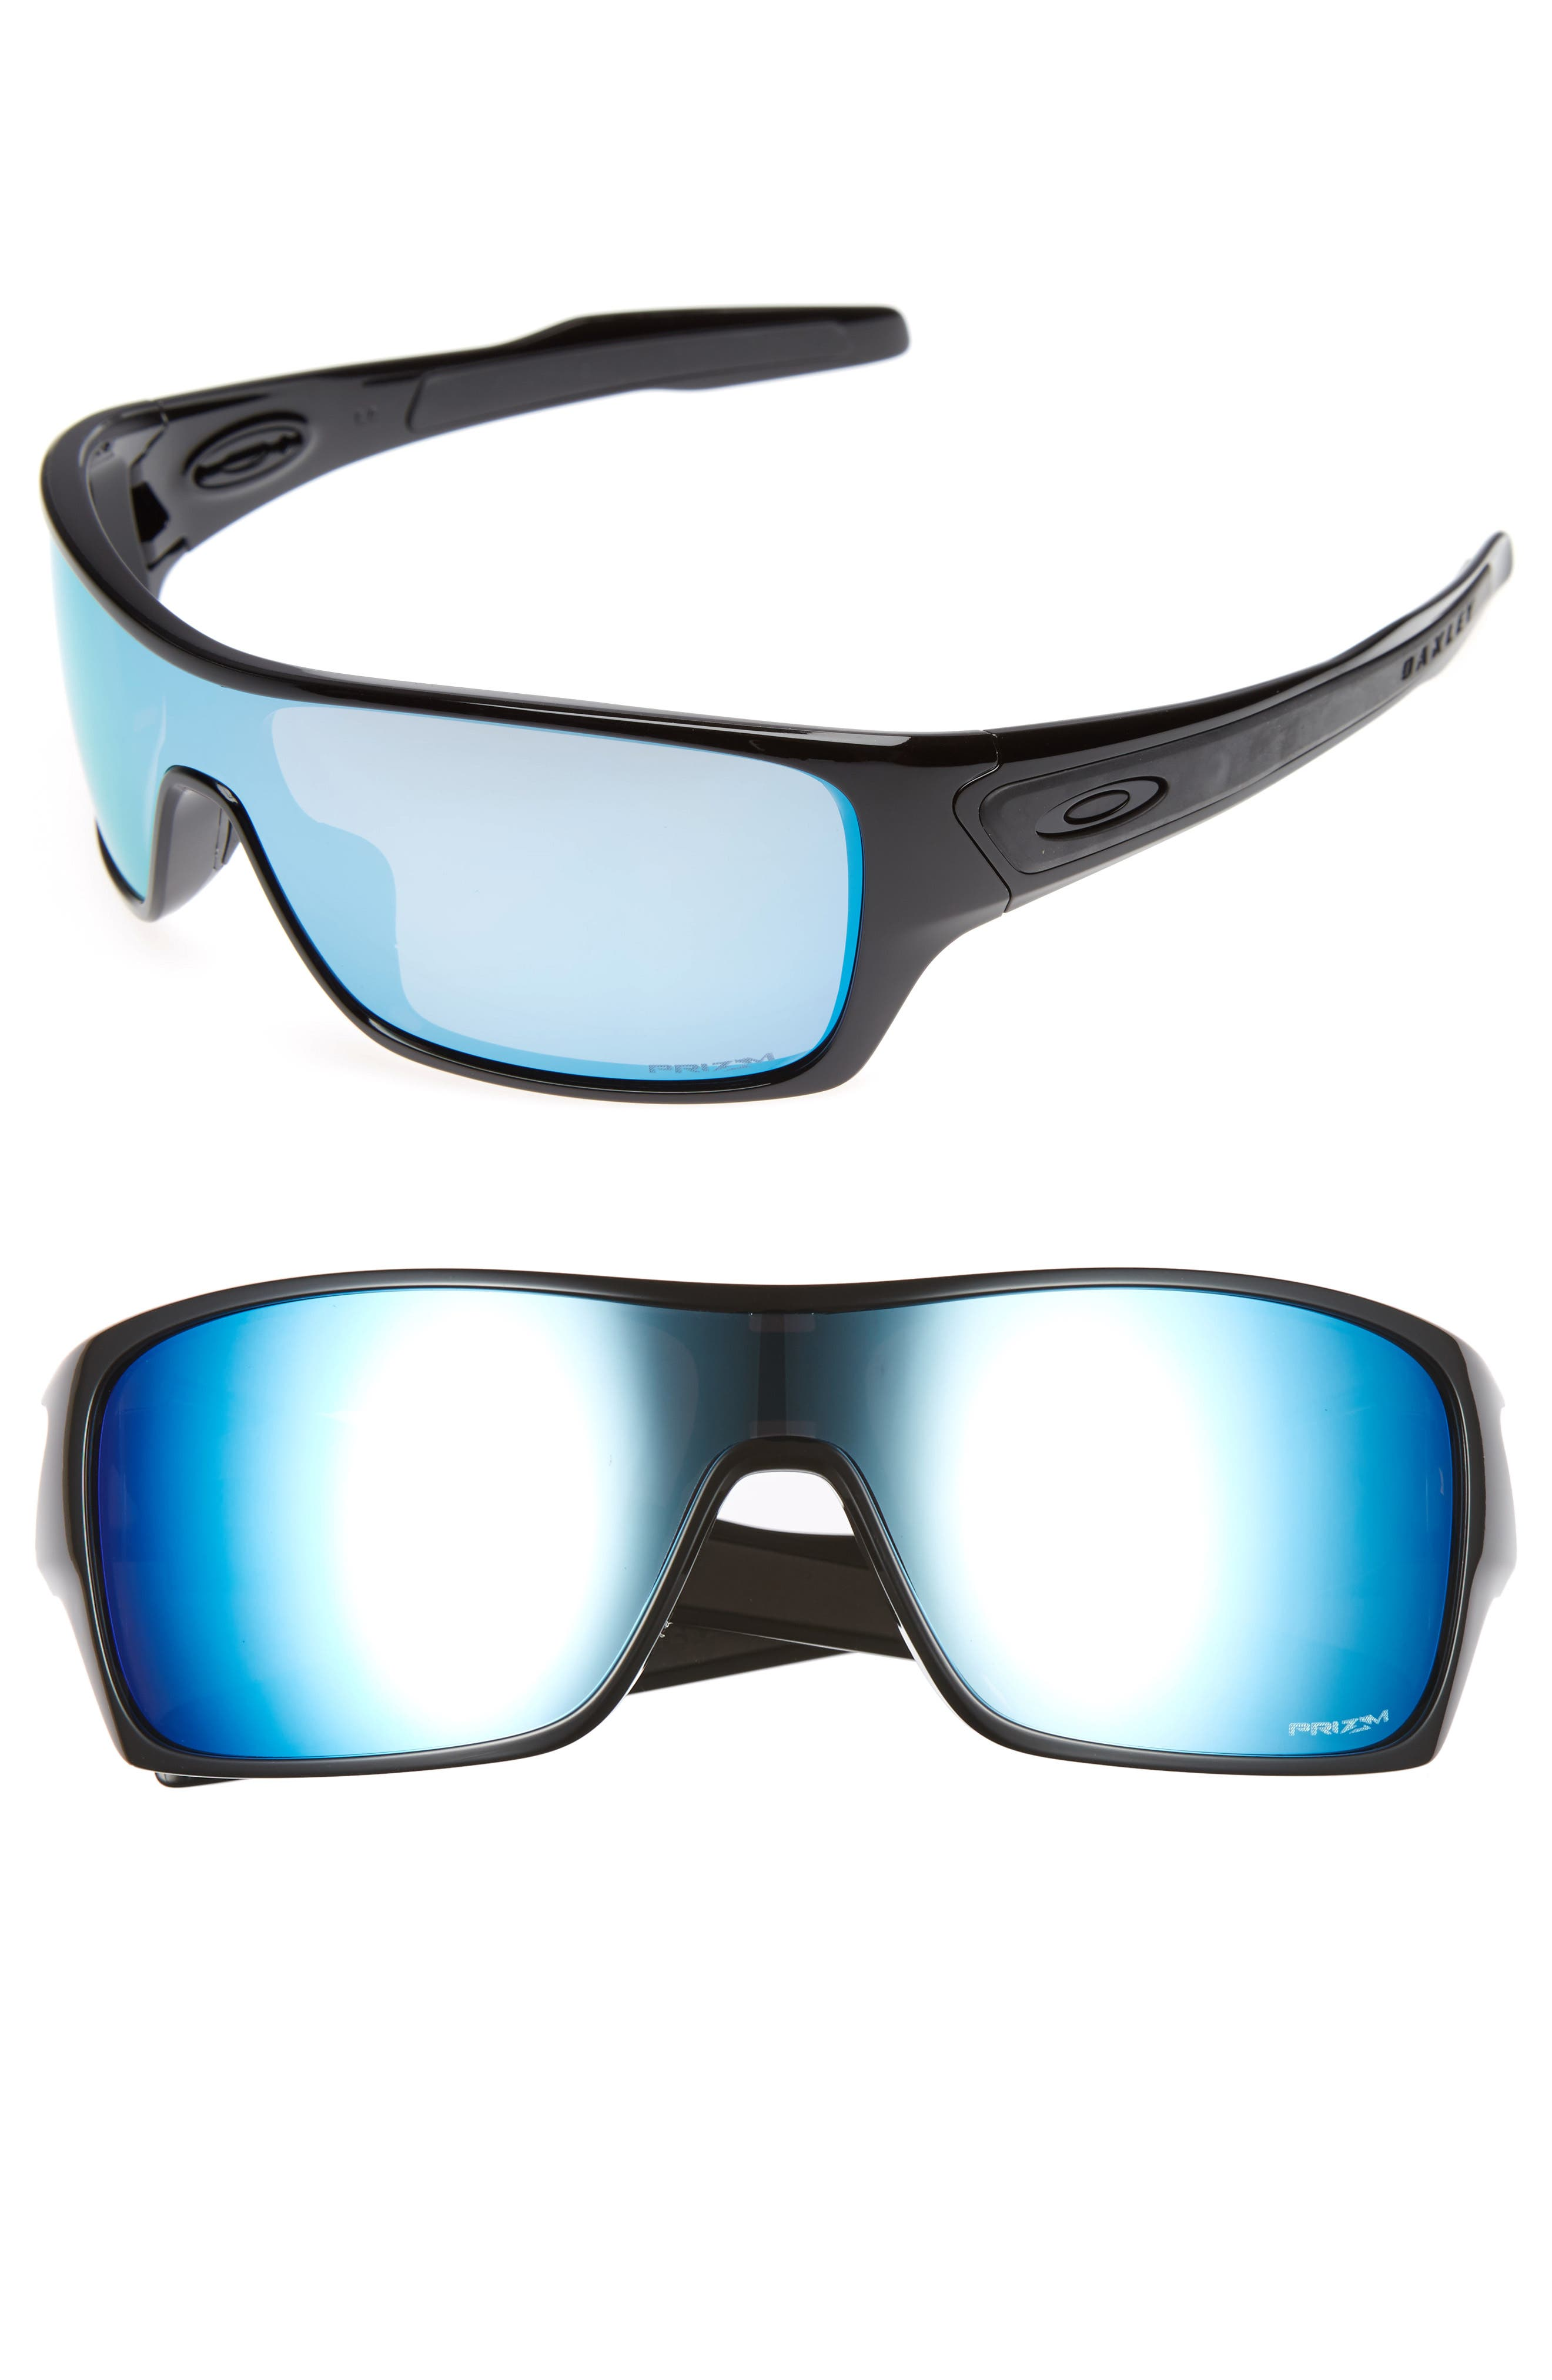 Turbine Rotor 68mm Polarized Sunglasses,                         Main,                         color, Black/Blue